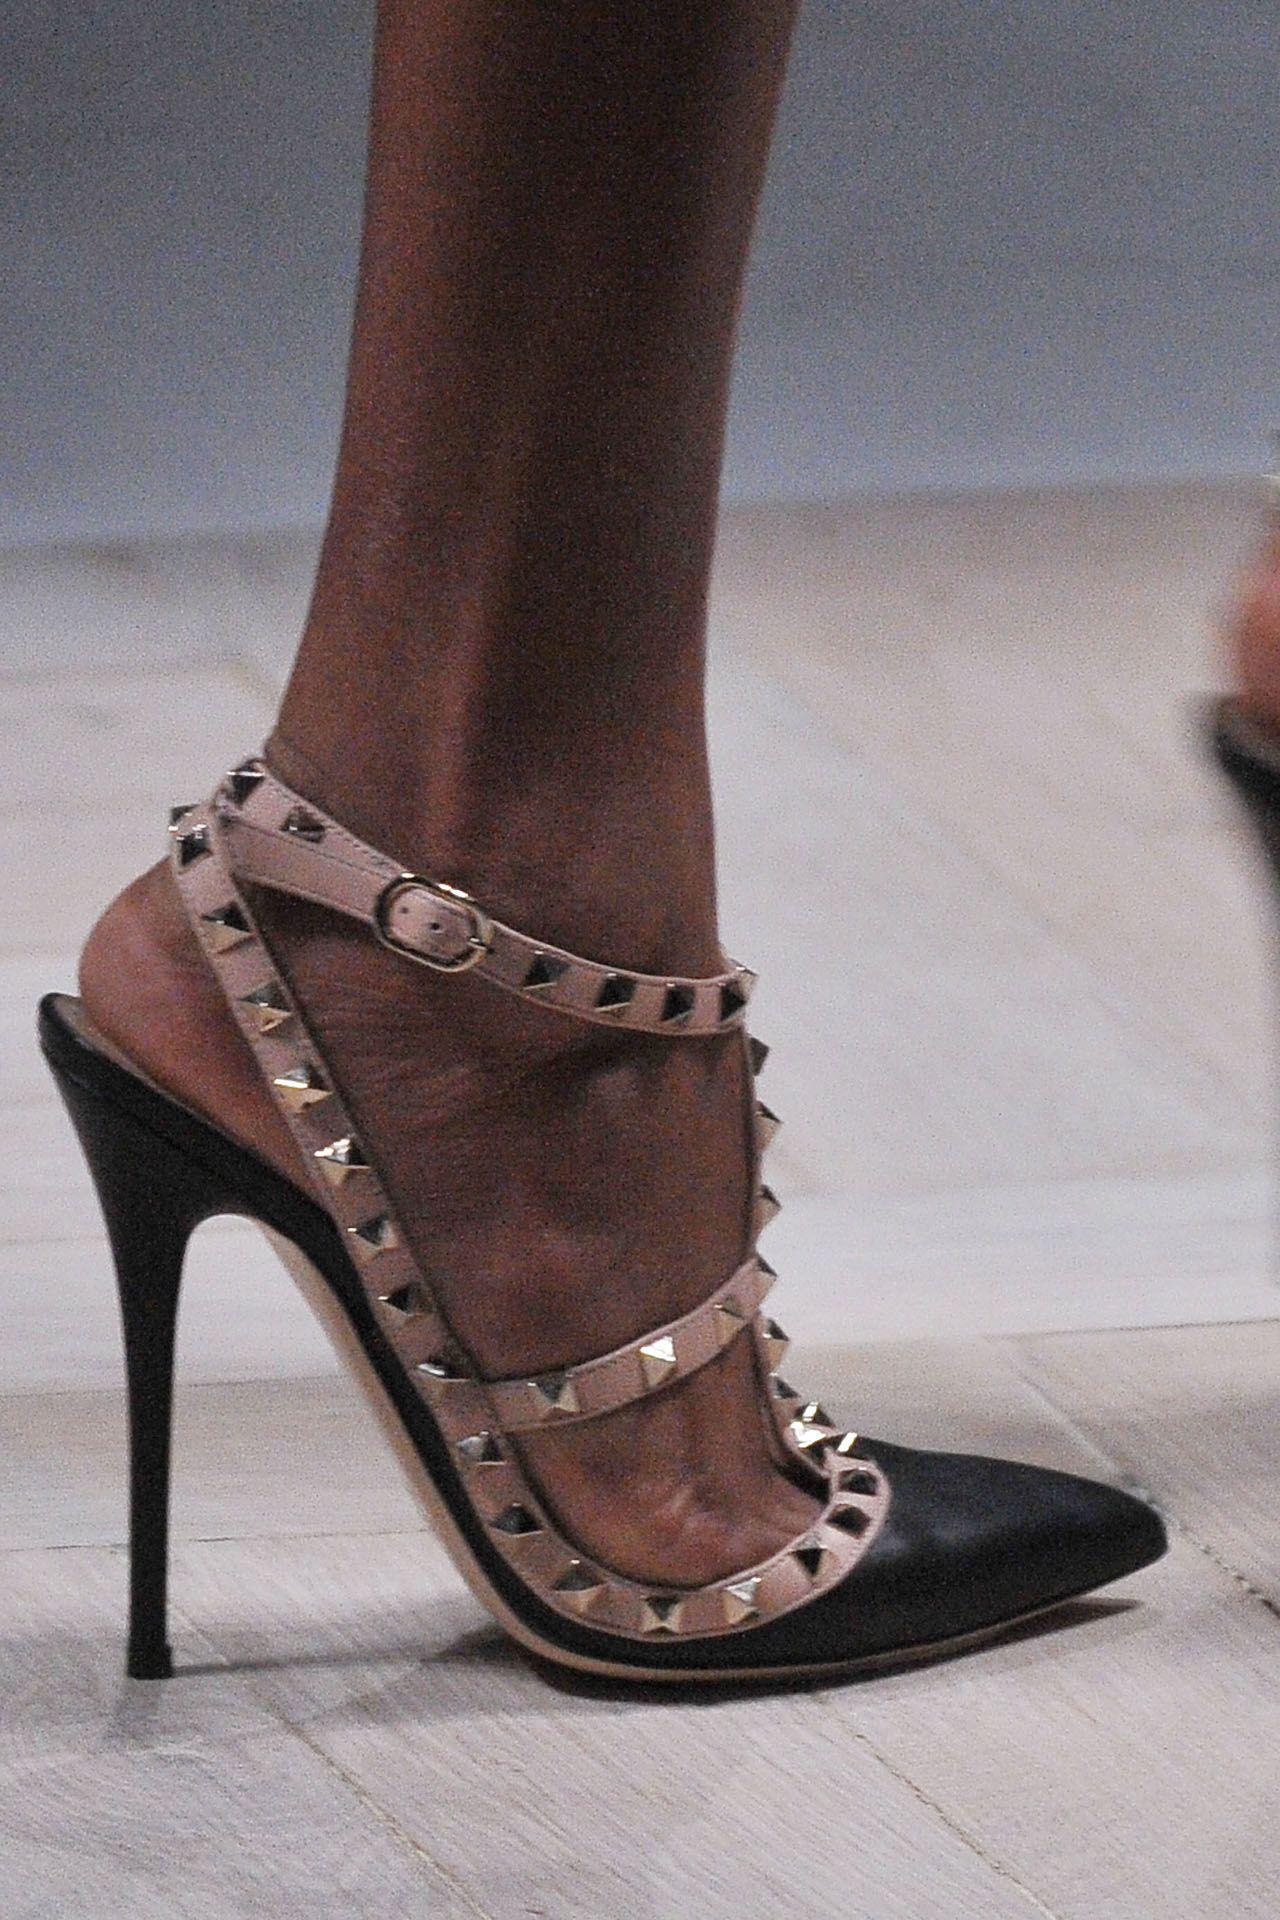 e1a9f9c86 Valentino ~ | wish list | Valentino studded heels, Studded heels, Shoes